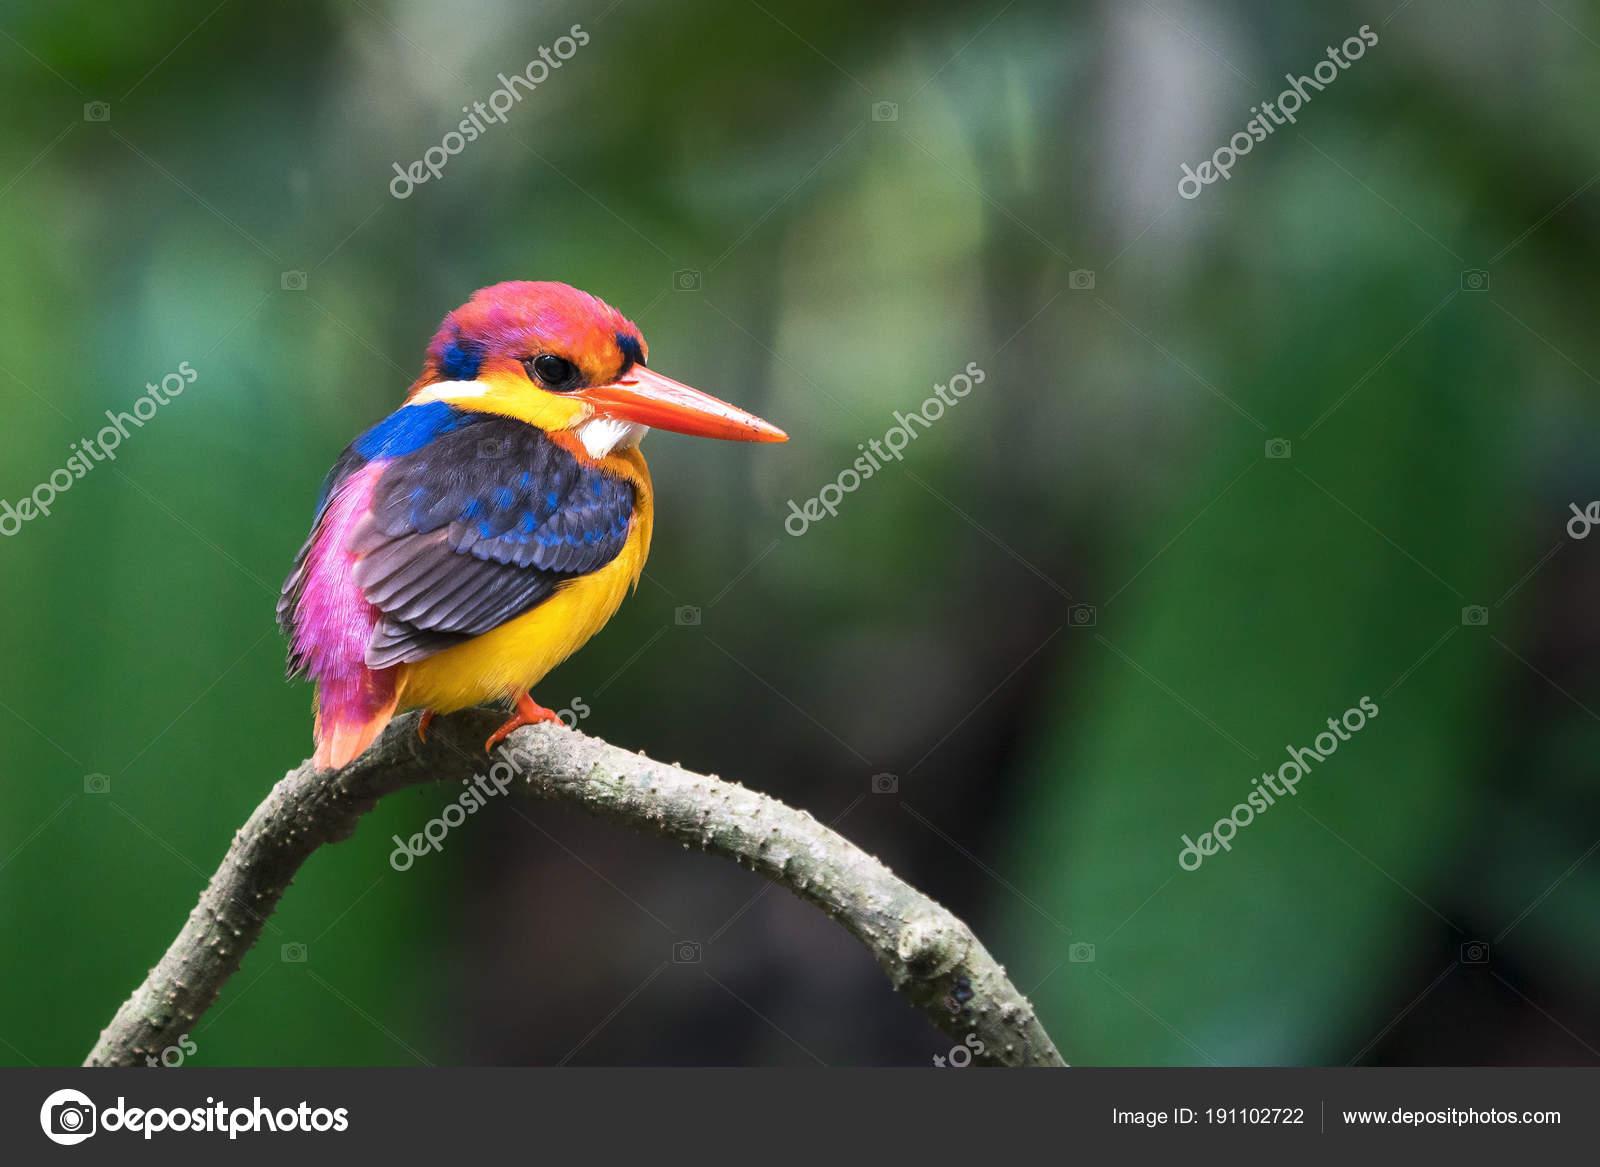 https://st3.depositphotos.com/3263921/19110/i/1600/depositphotos_191102722-stock-photo-beautiful-bird-oriental-dwarf-kingfisher.jpg